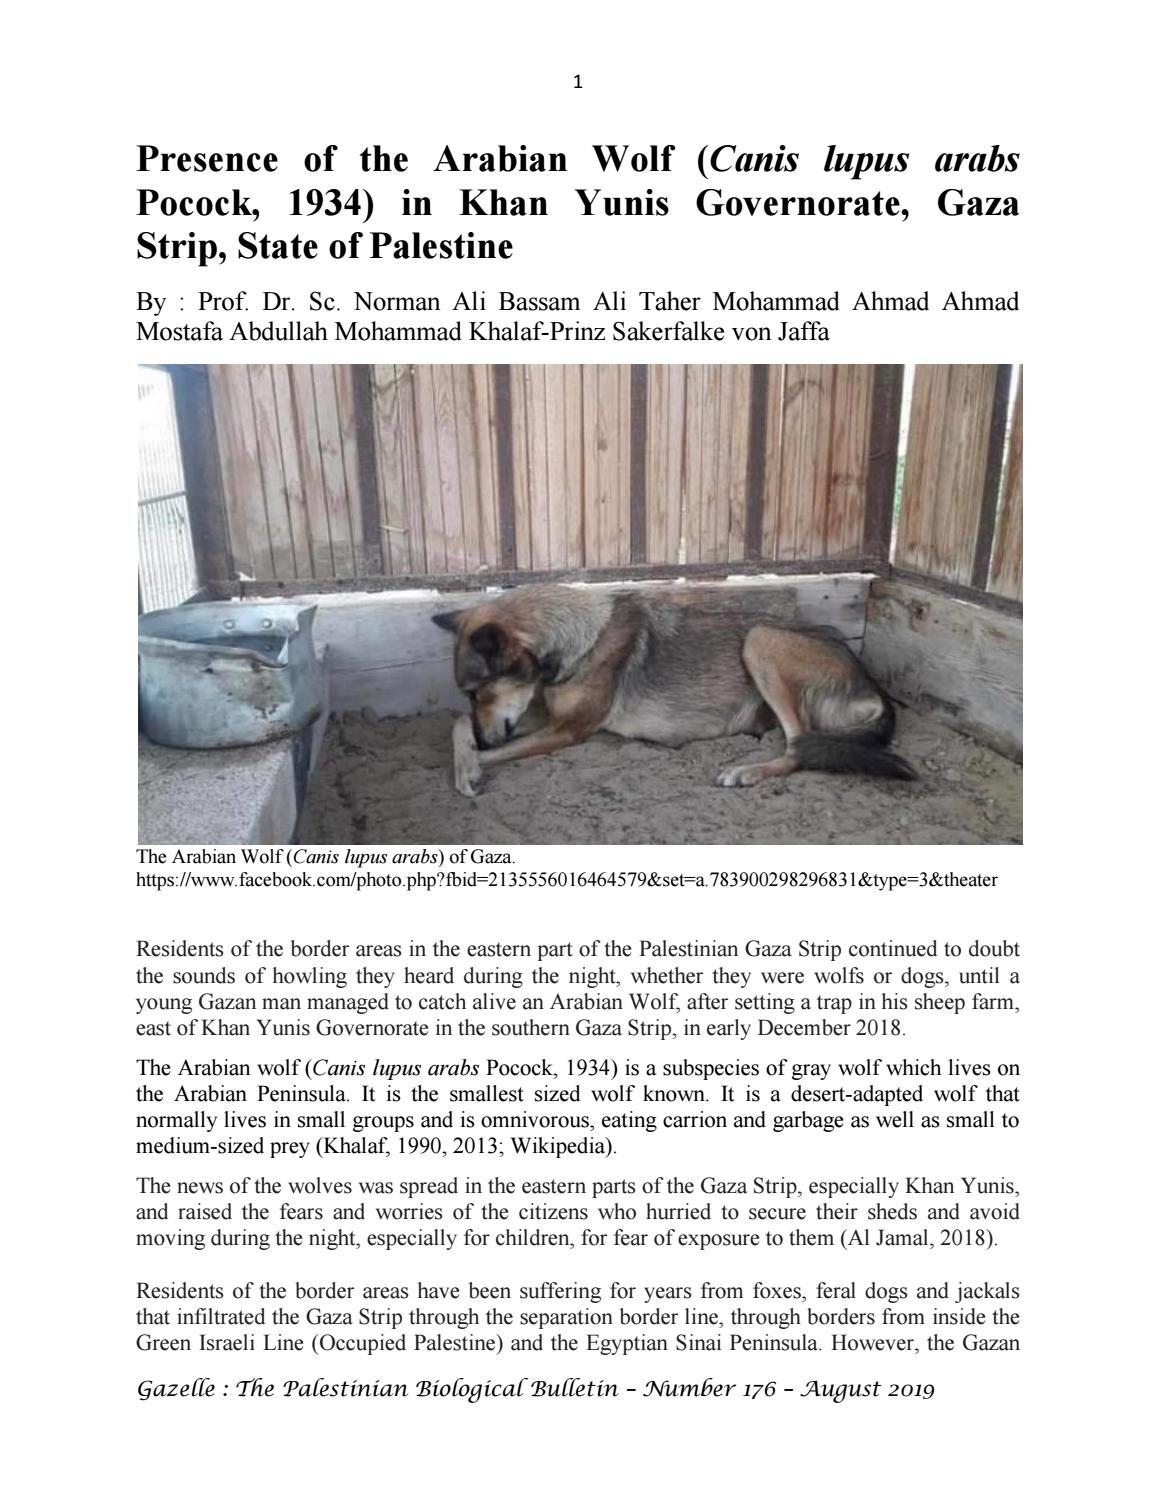 Presence Of The Arabian Wolf Canis Lupus Arabs In Khan Yunis